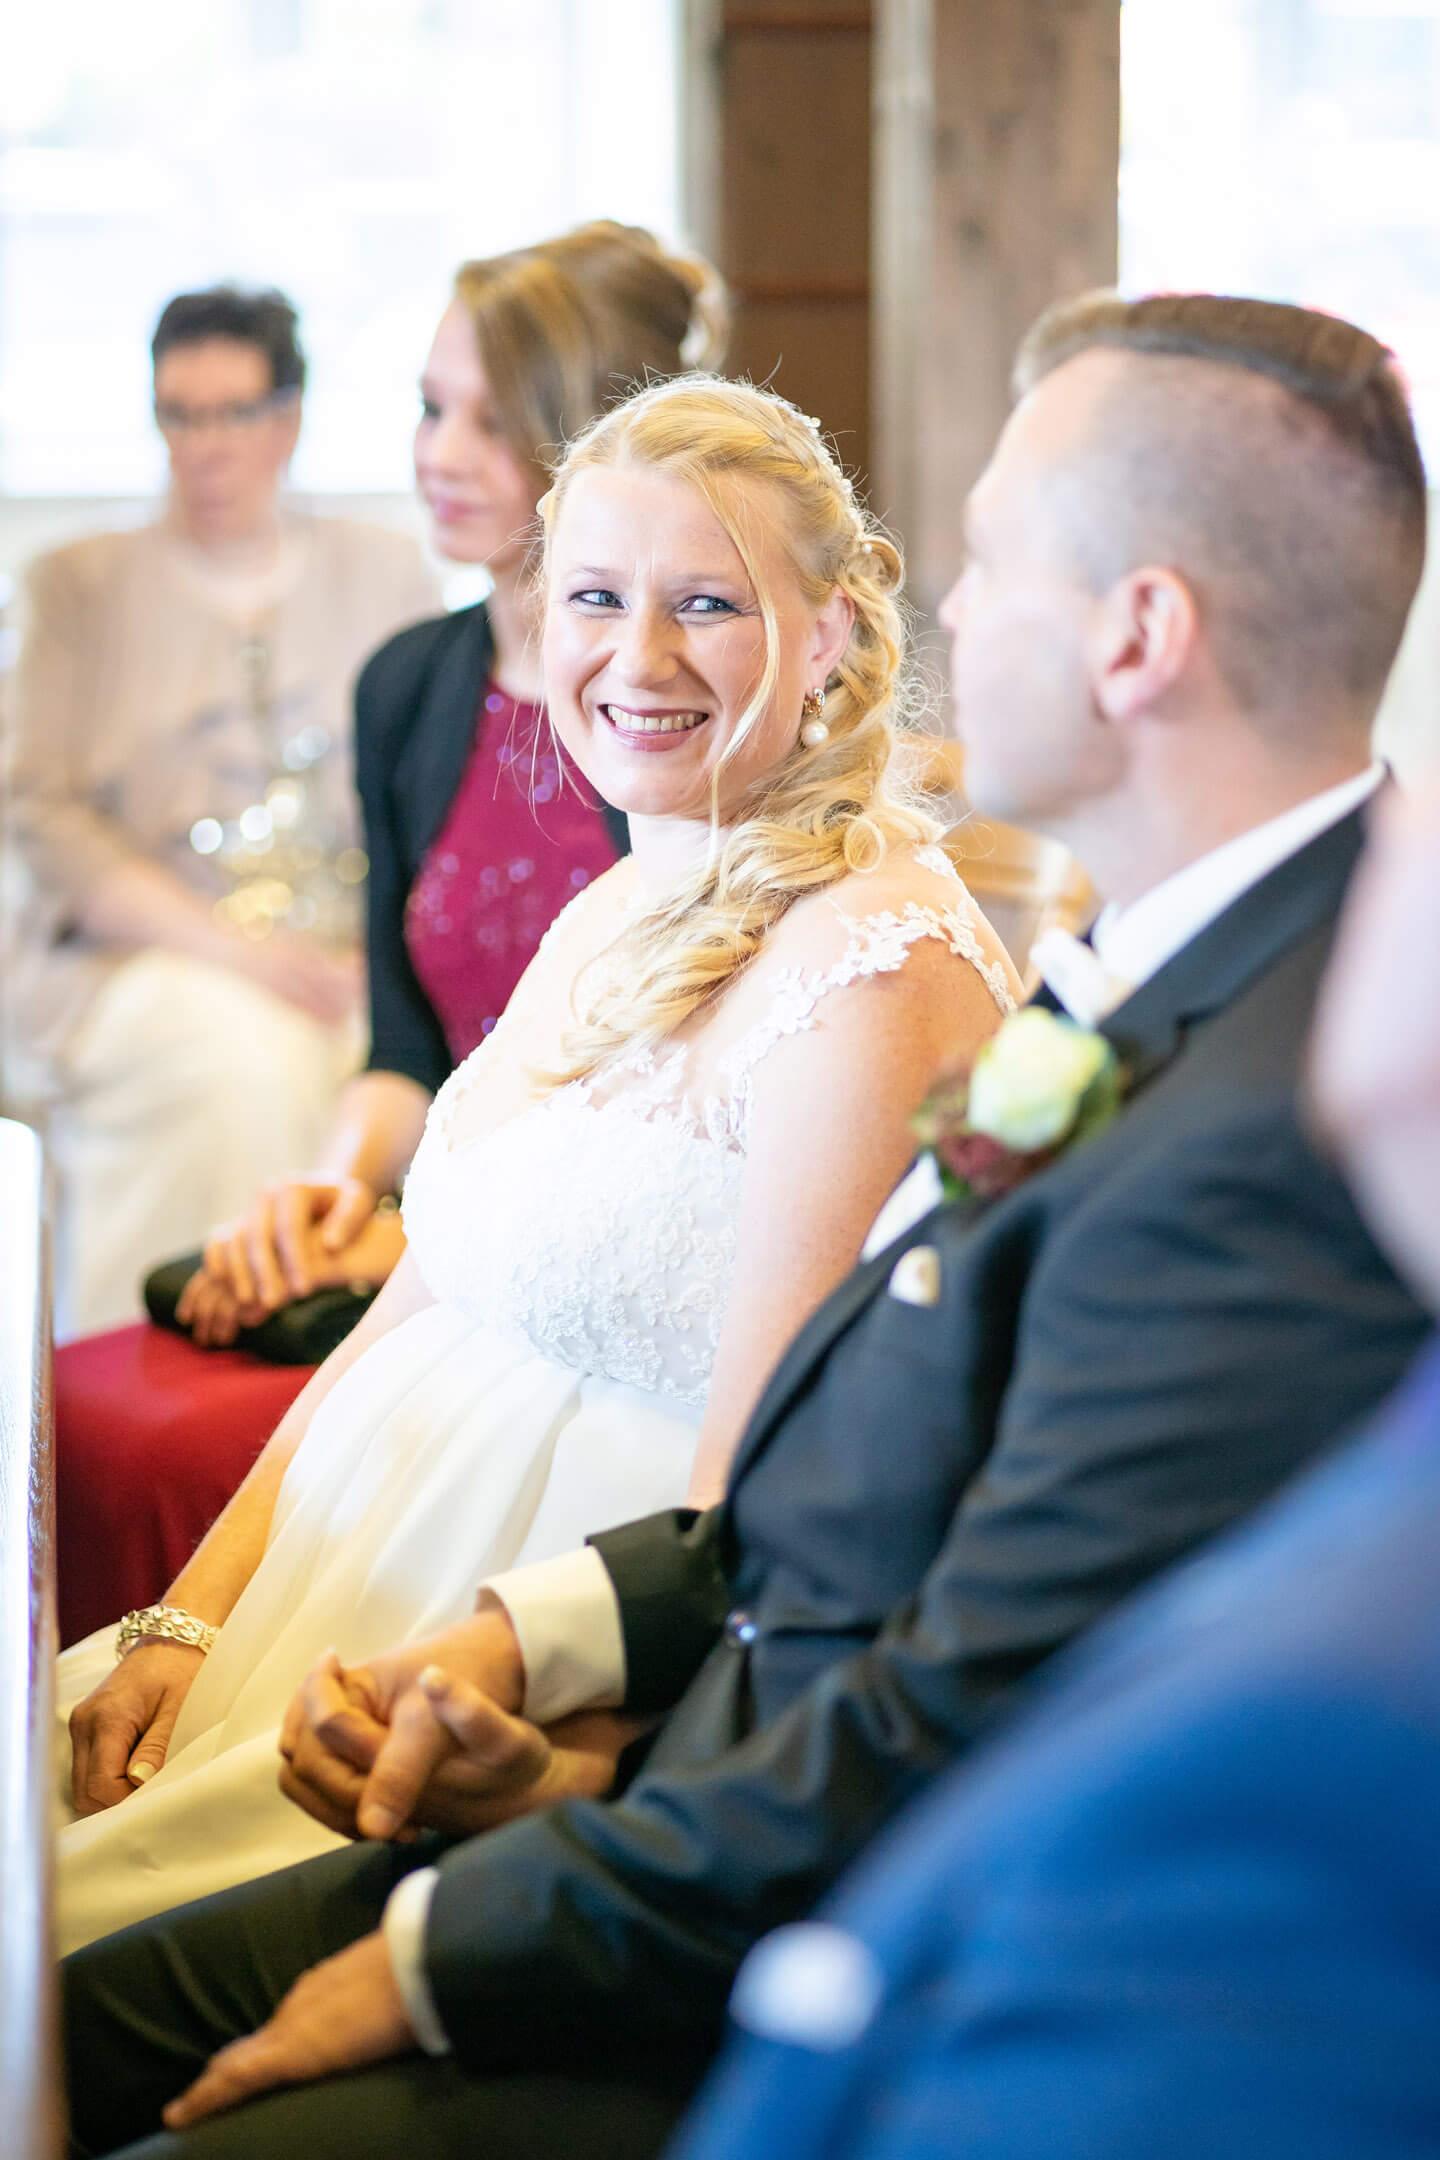 Braut blickt Bräutigam bei der Trauung lachend an.